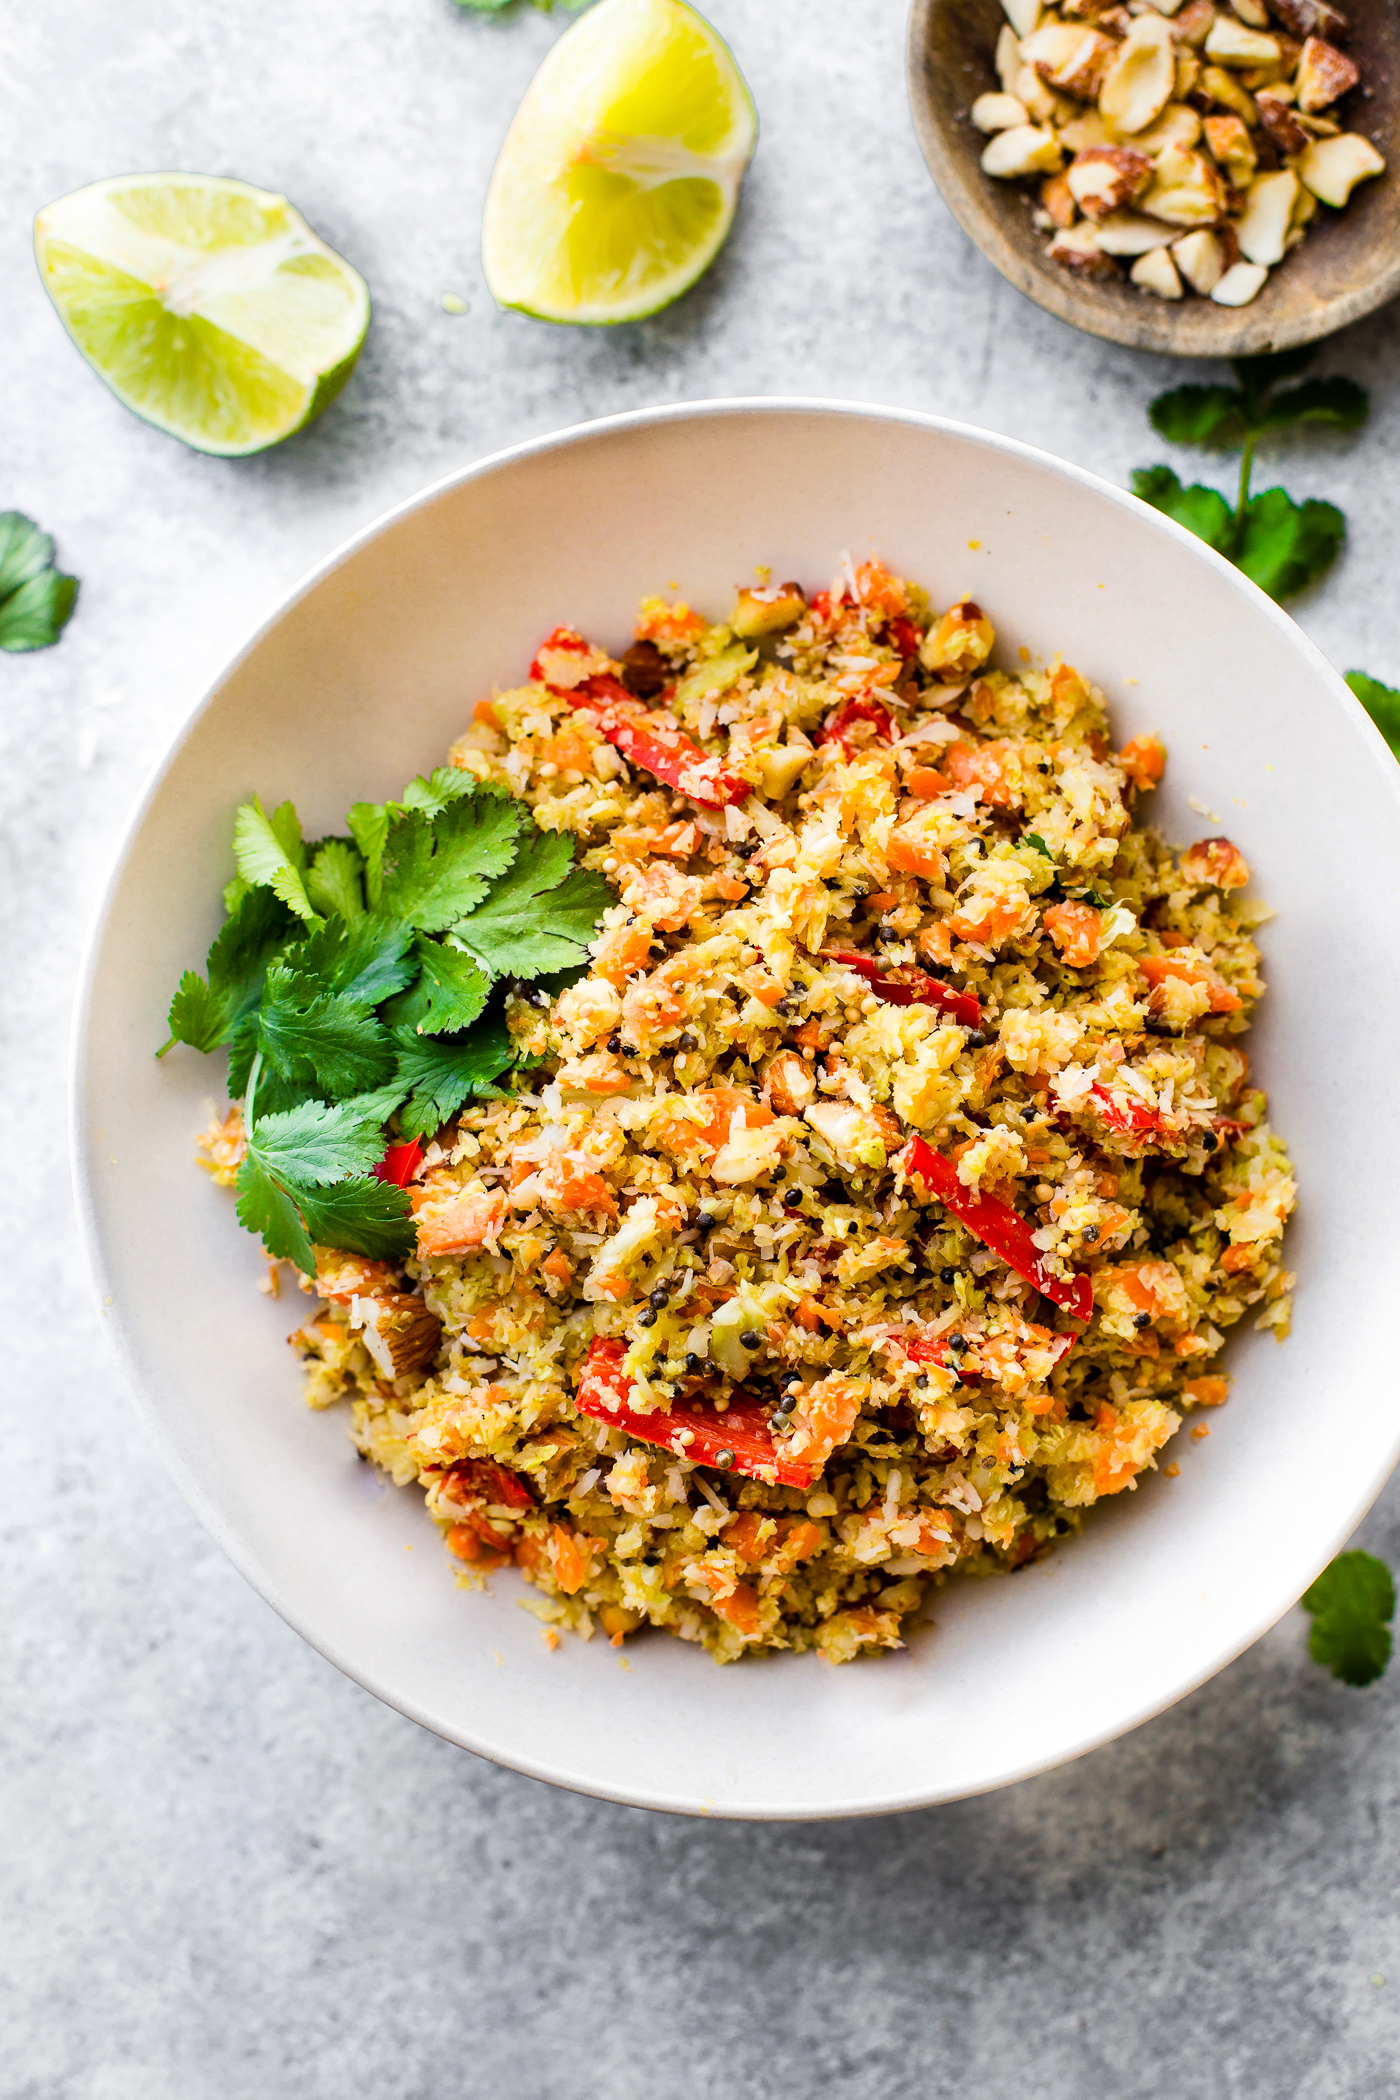 Gujarati Style Coconut Almond Warm Cabbage Salad